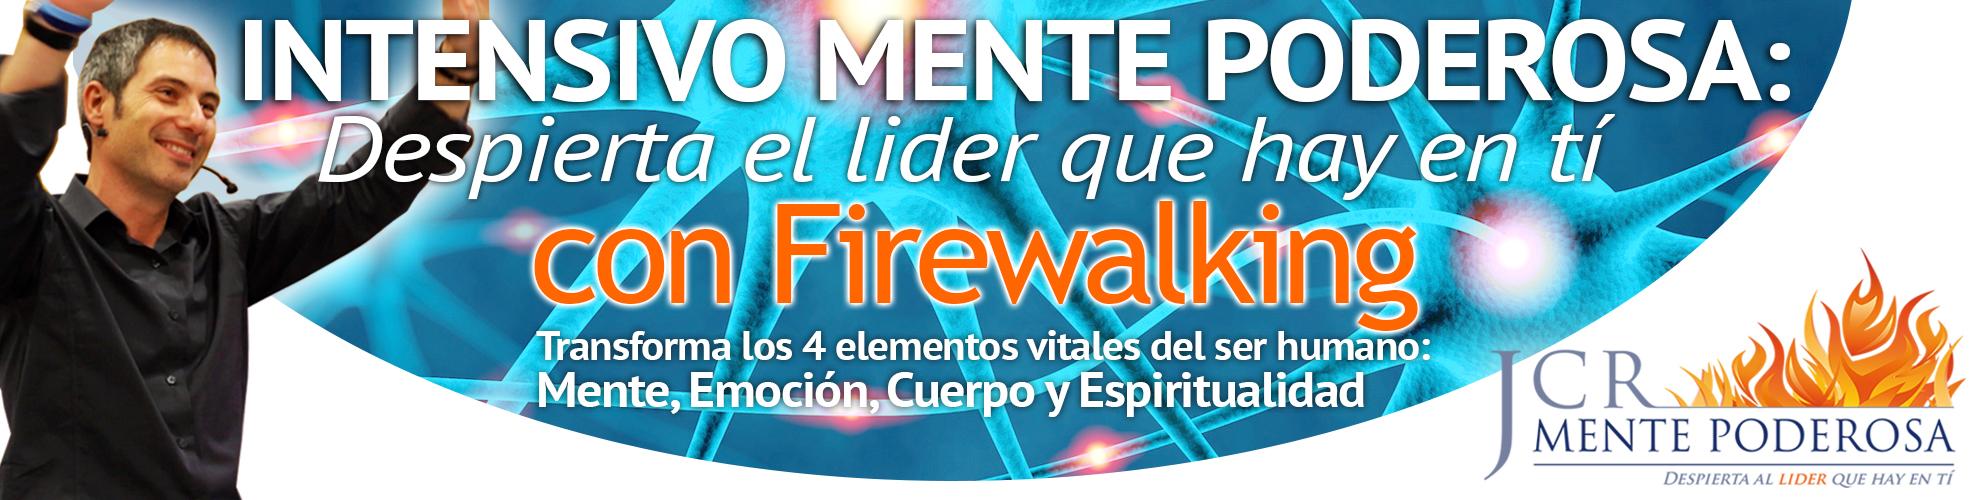 Seminario Intensivo Mente poderosa con Firewalking